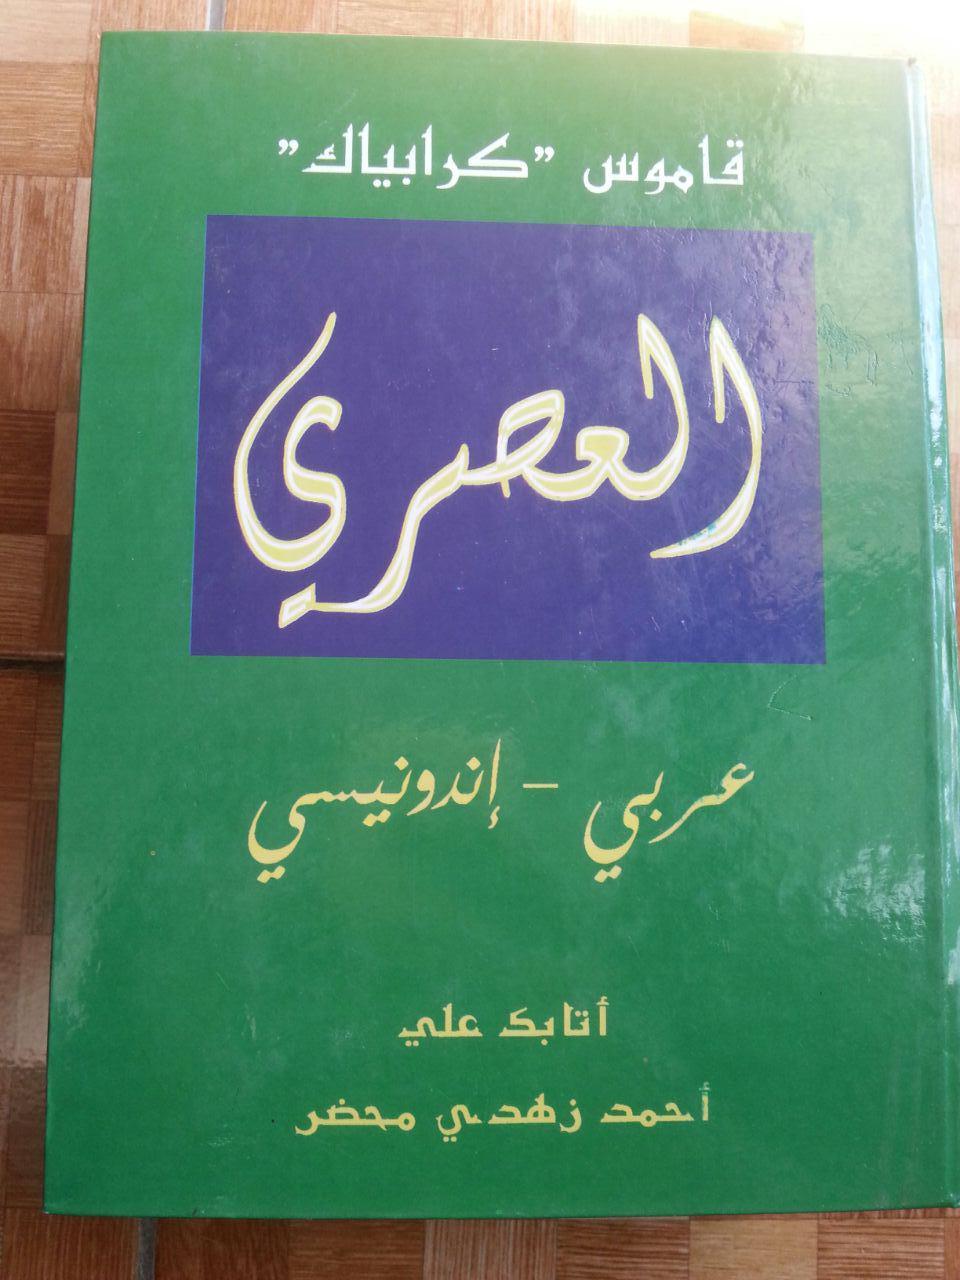 Kamus Al-'Ashri Kamus Kontemporer Arab Indonesia cover 2